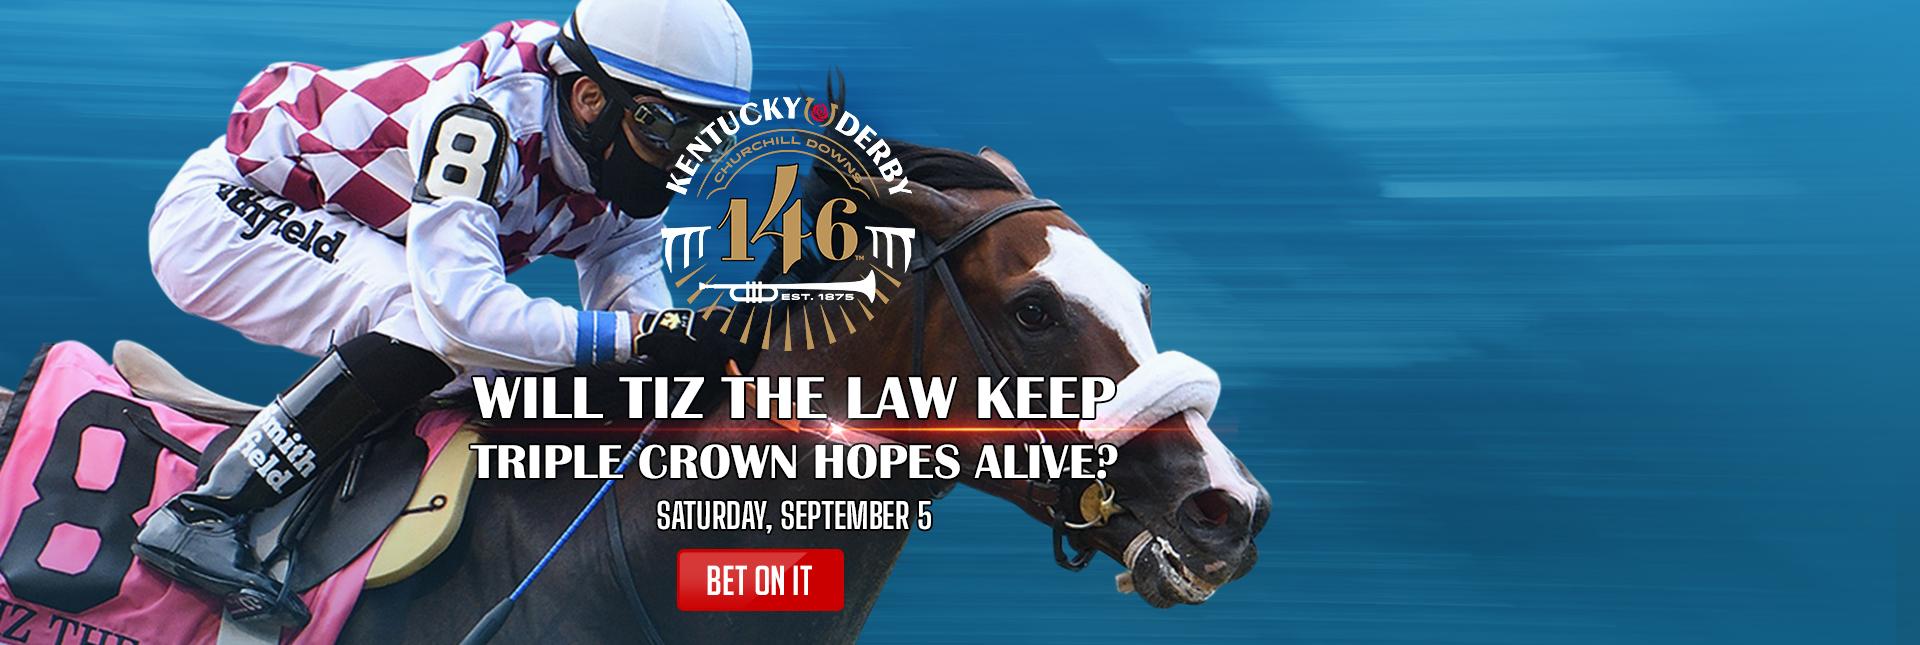 146 Kentucky Derby